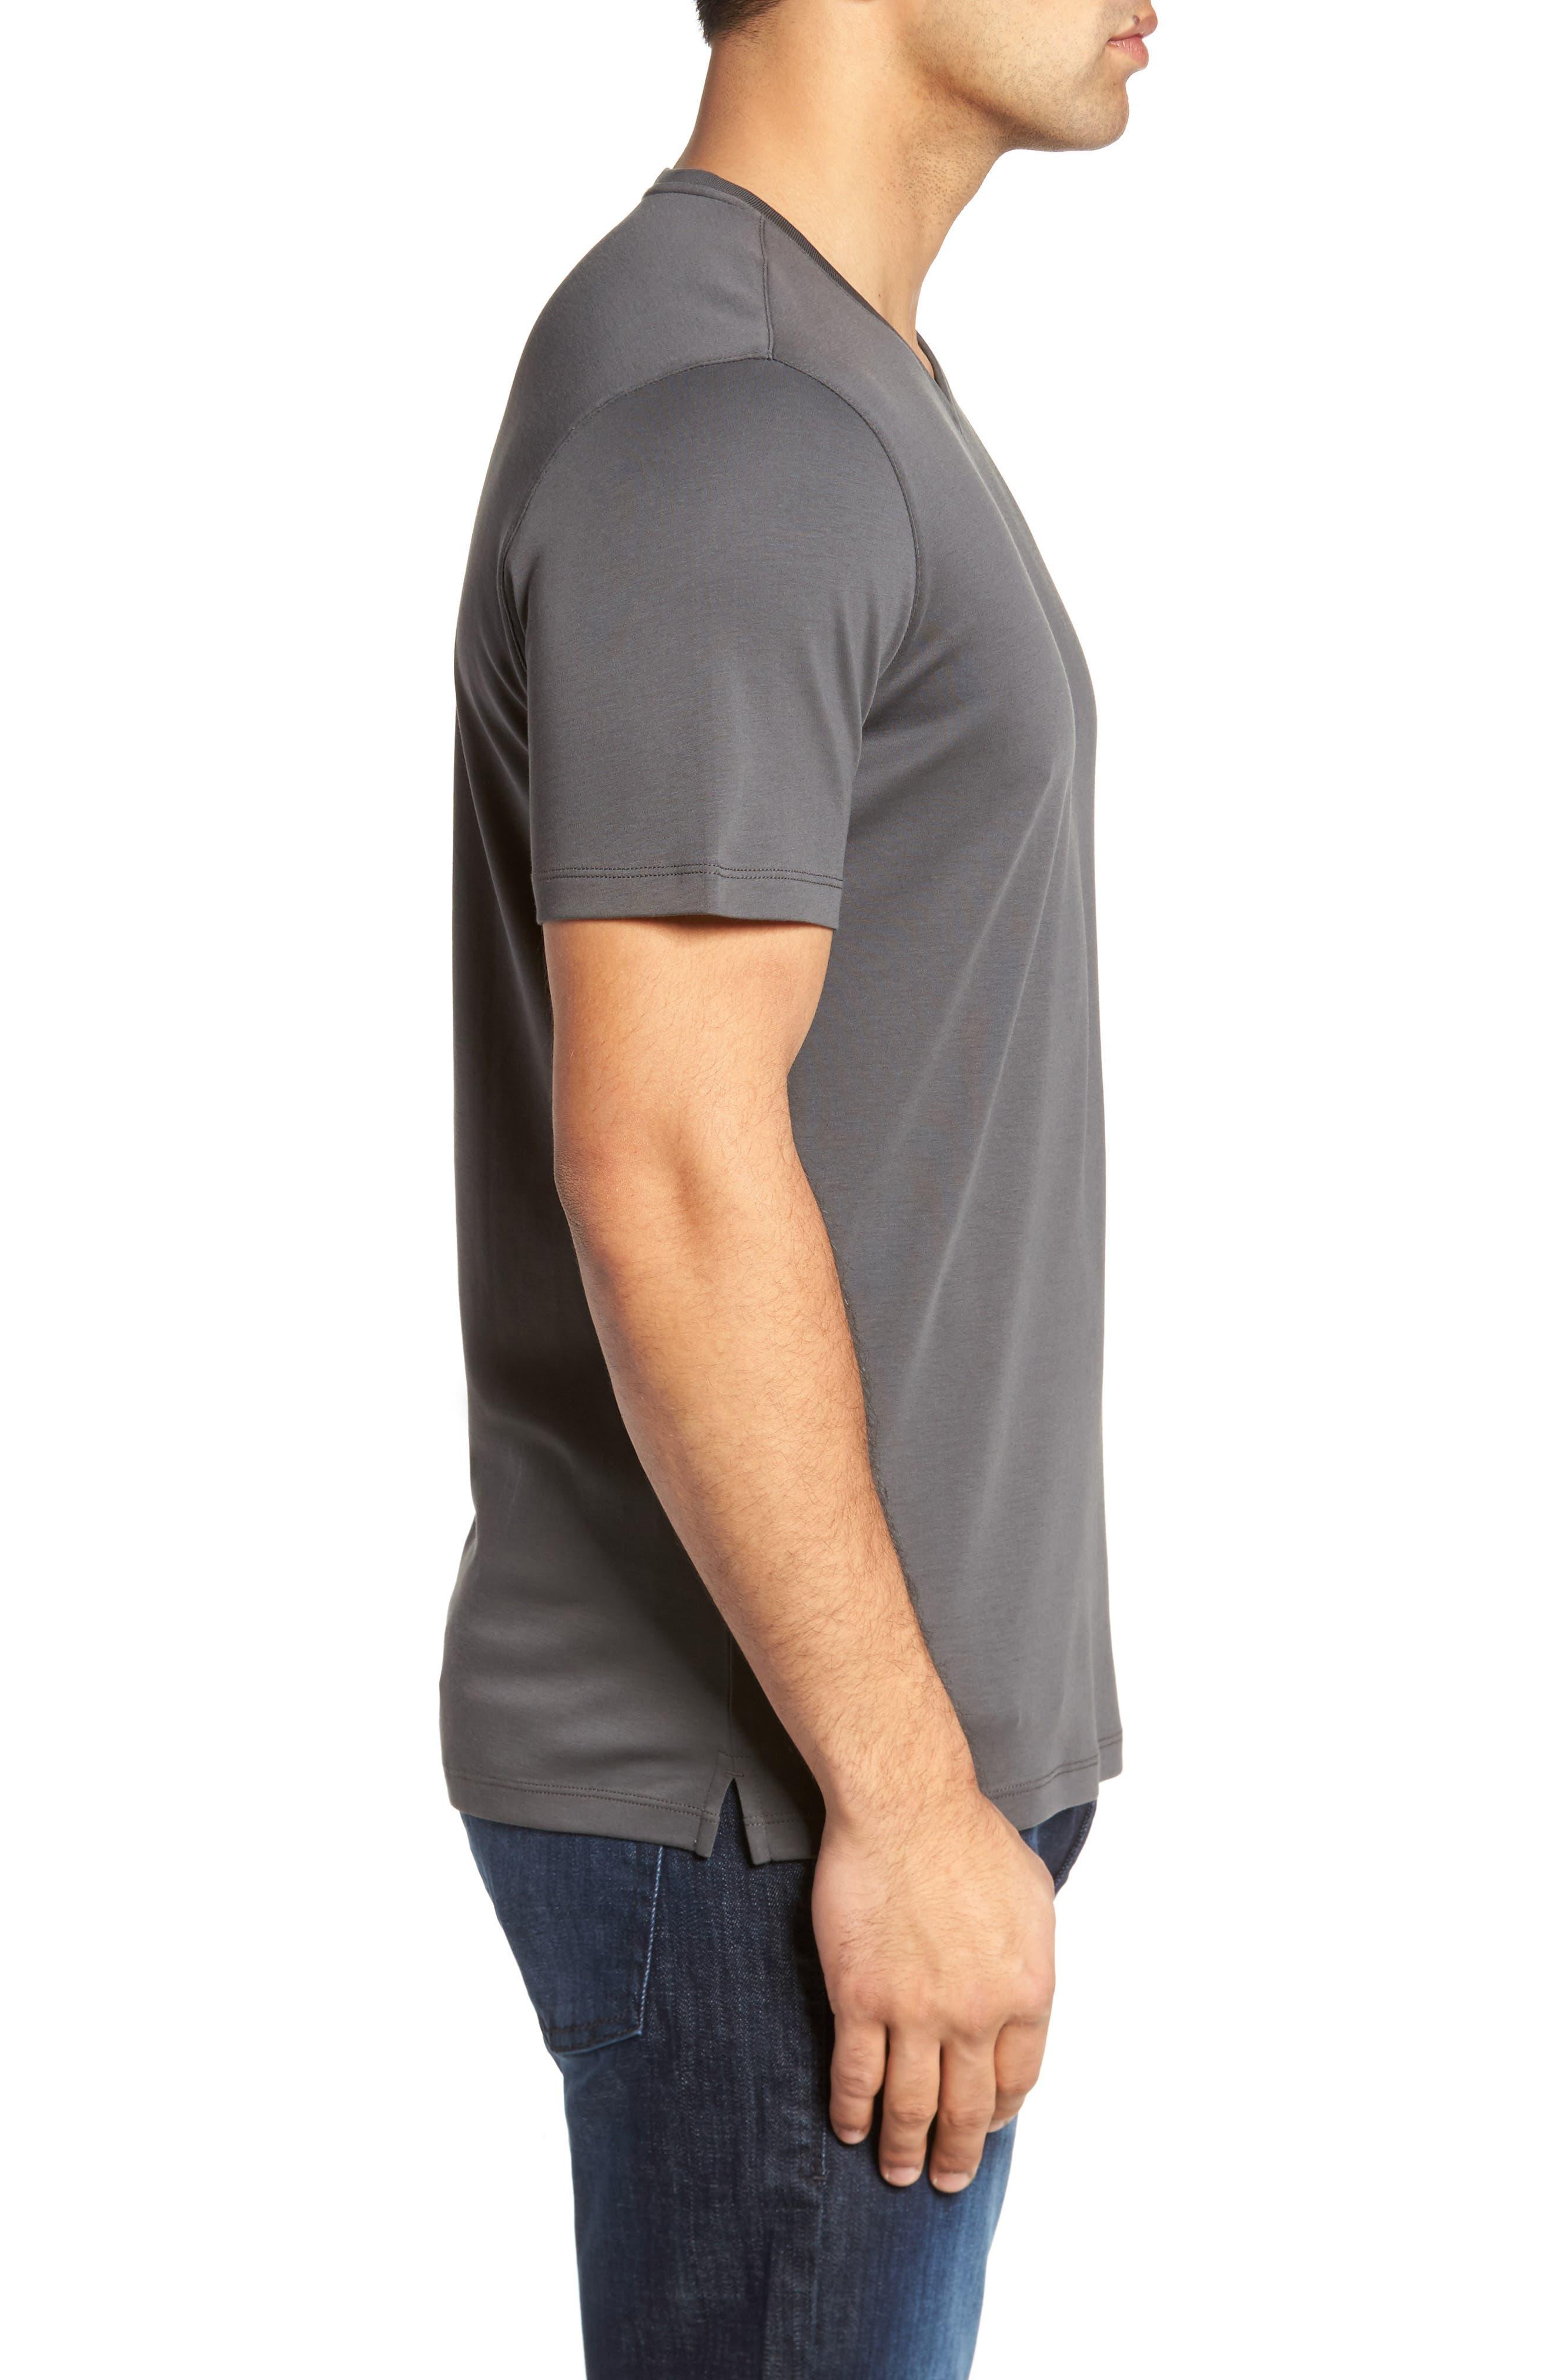 ROBERT BARAKETT, Georgia Regular Fit V-Neck T-Shirt, Alternate thumbnail 3, color, IRON